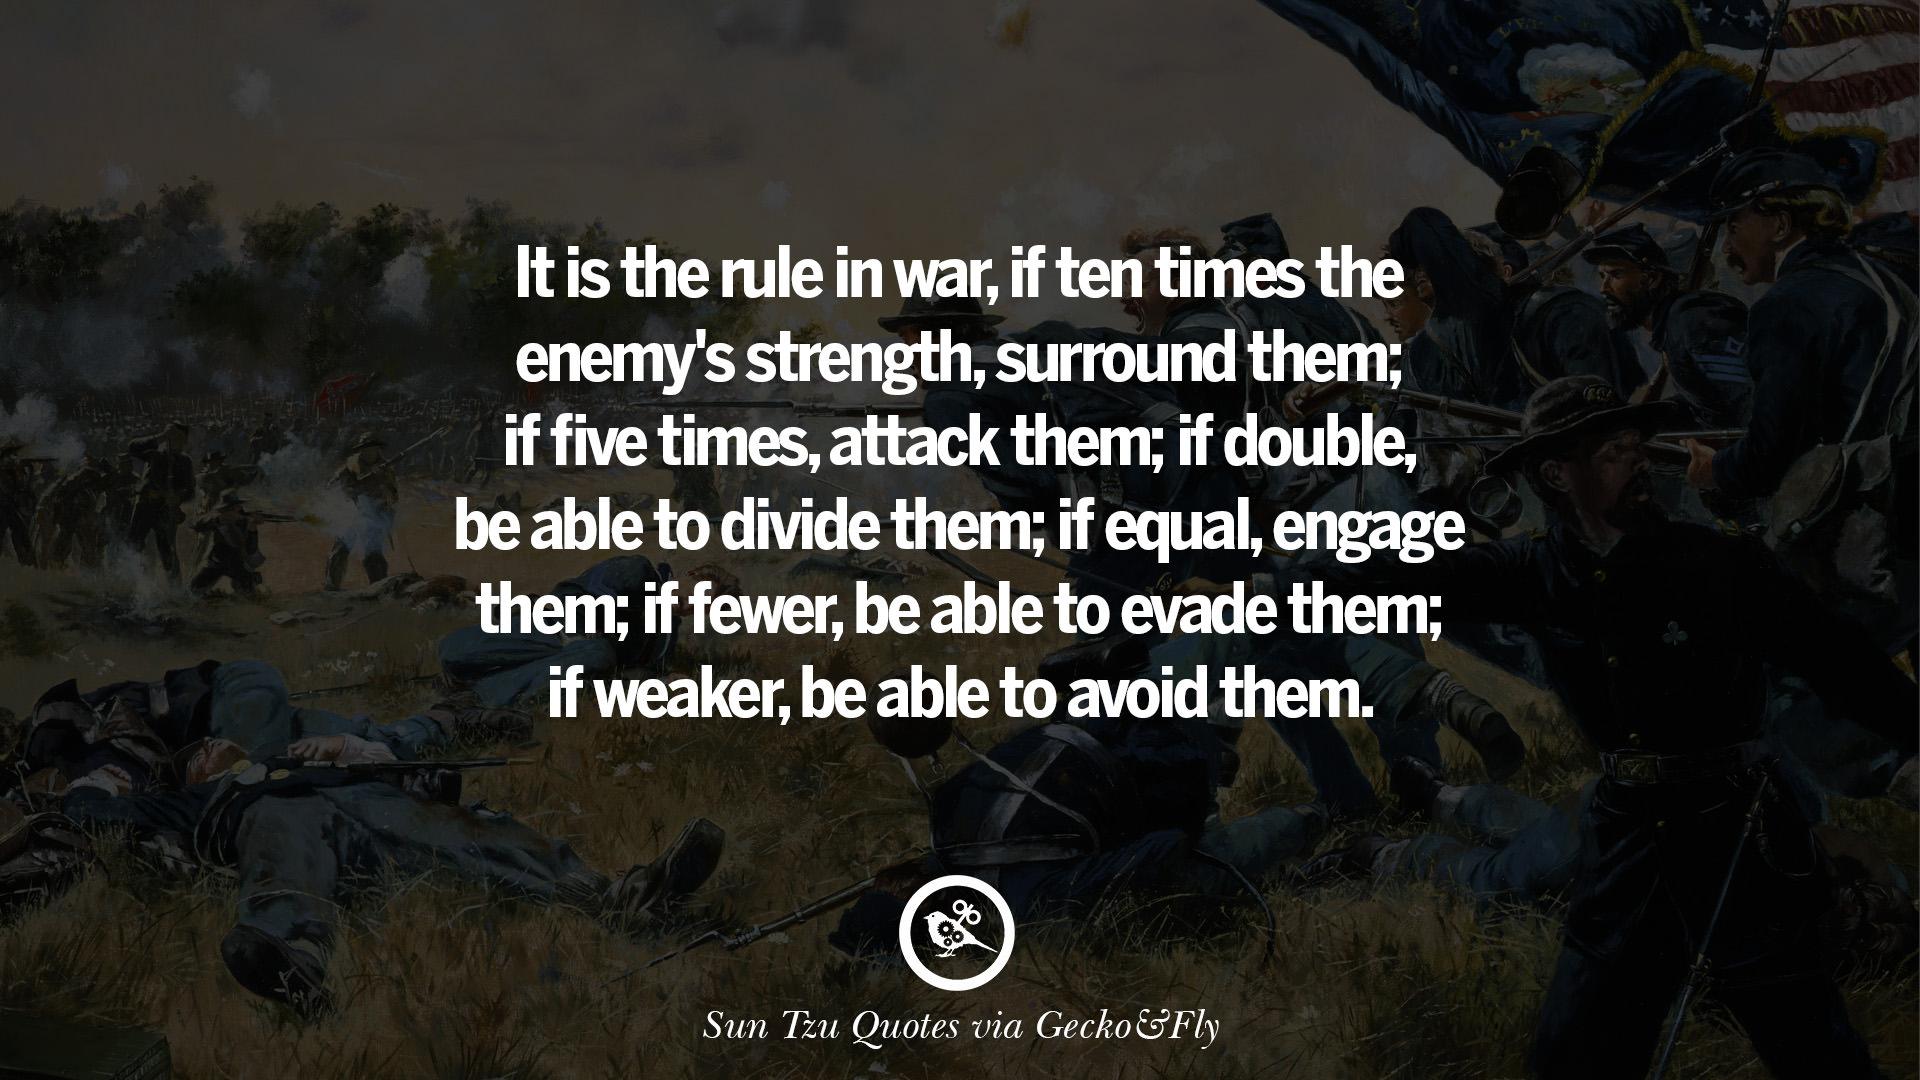 sun tsu art of war Sun tzu is the reputed author of the art of war (of sun wu himself (tzu is an honorific particle.